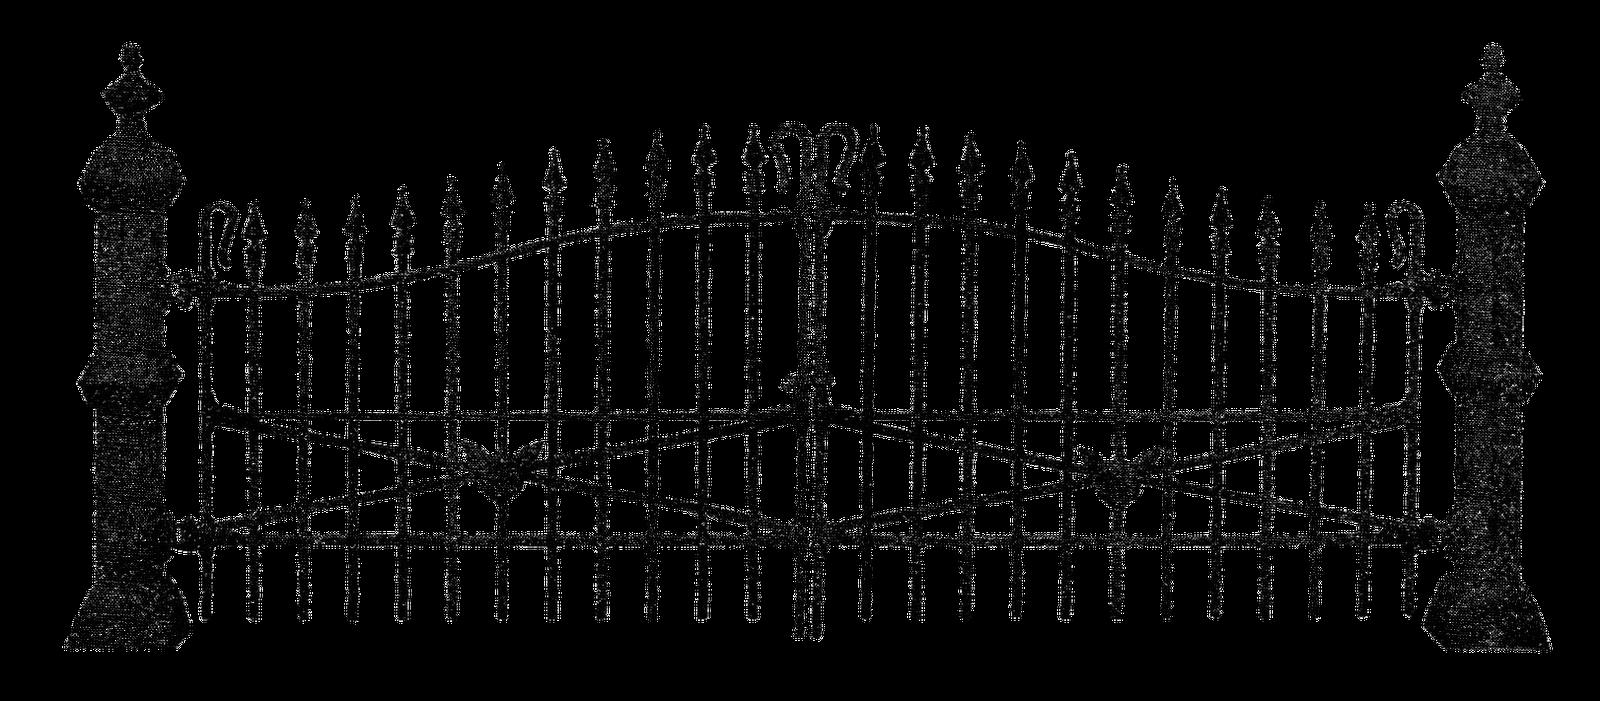 Creepy Broken Cemetery Fence Google Search Halloween Vector Layout Design Inspiration Cemetery